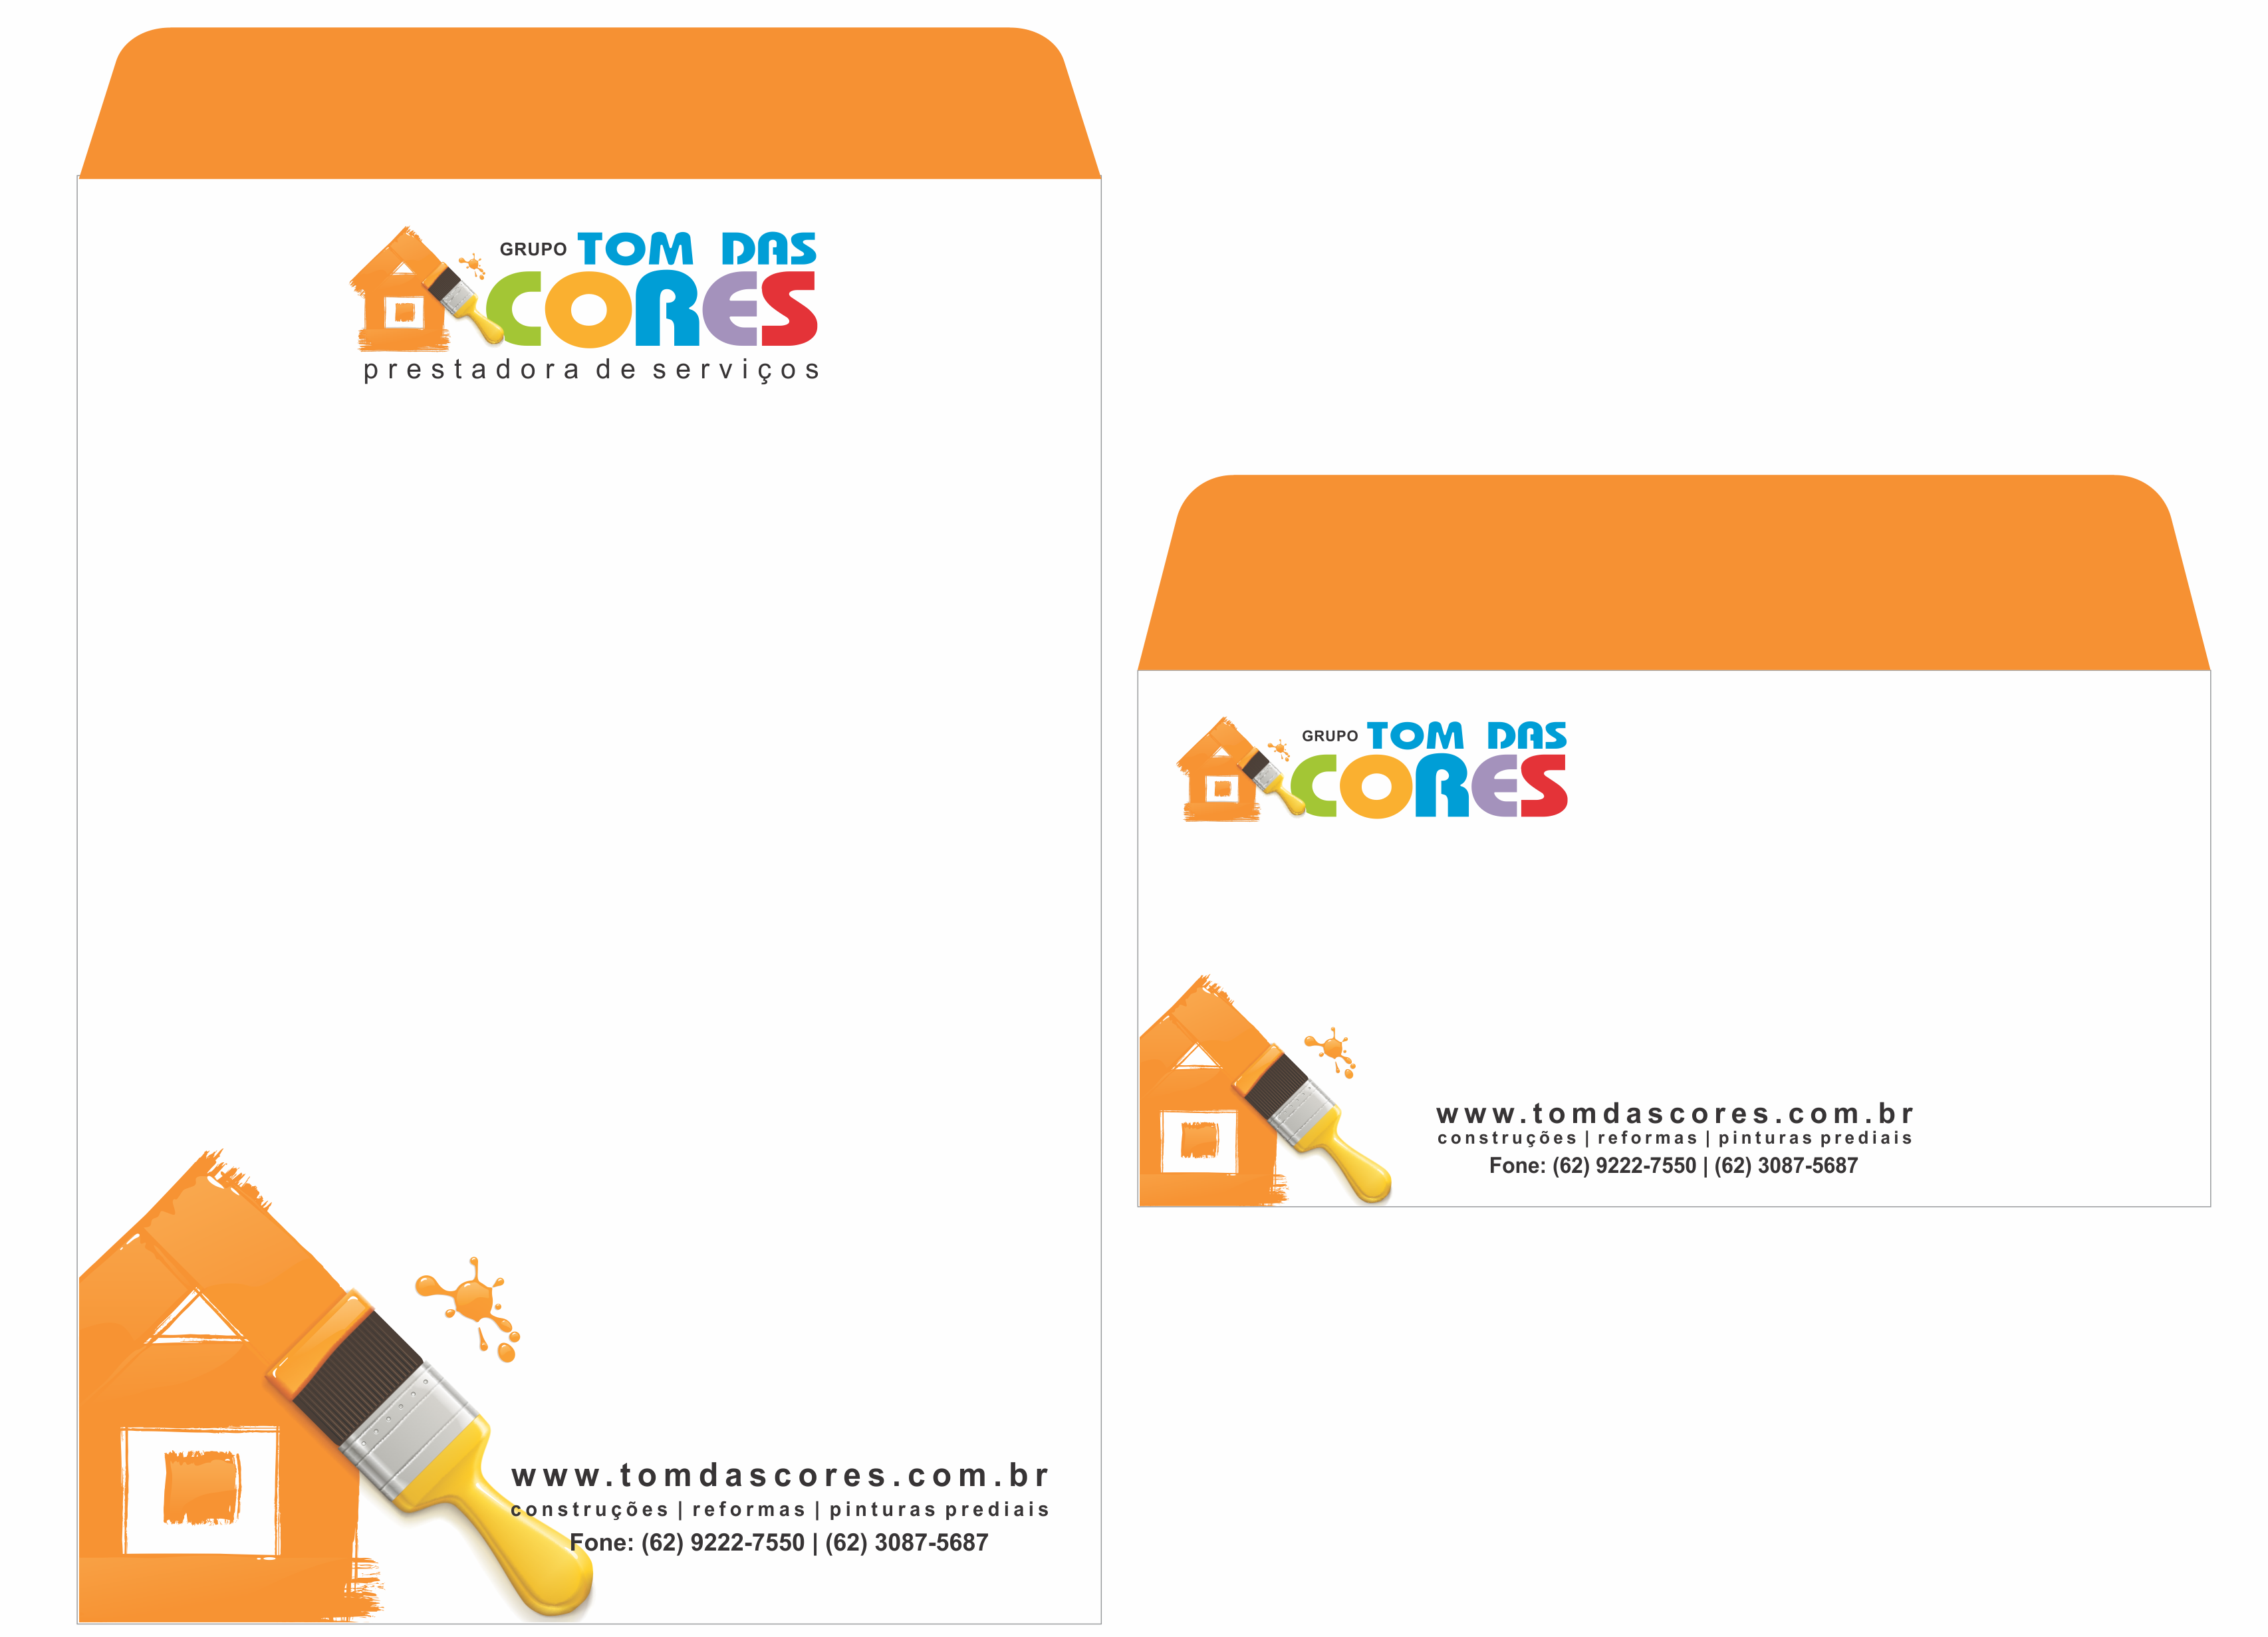 Arte E Diagramao De Envelope Saco Carta Para Grupo Tom Das Cores